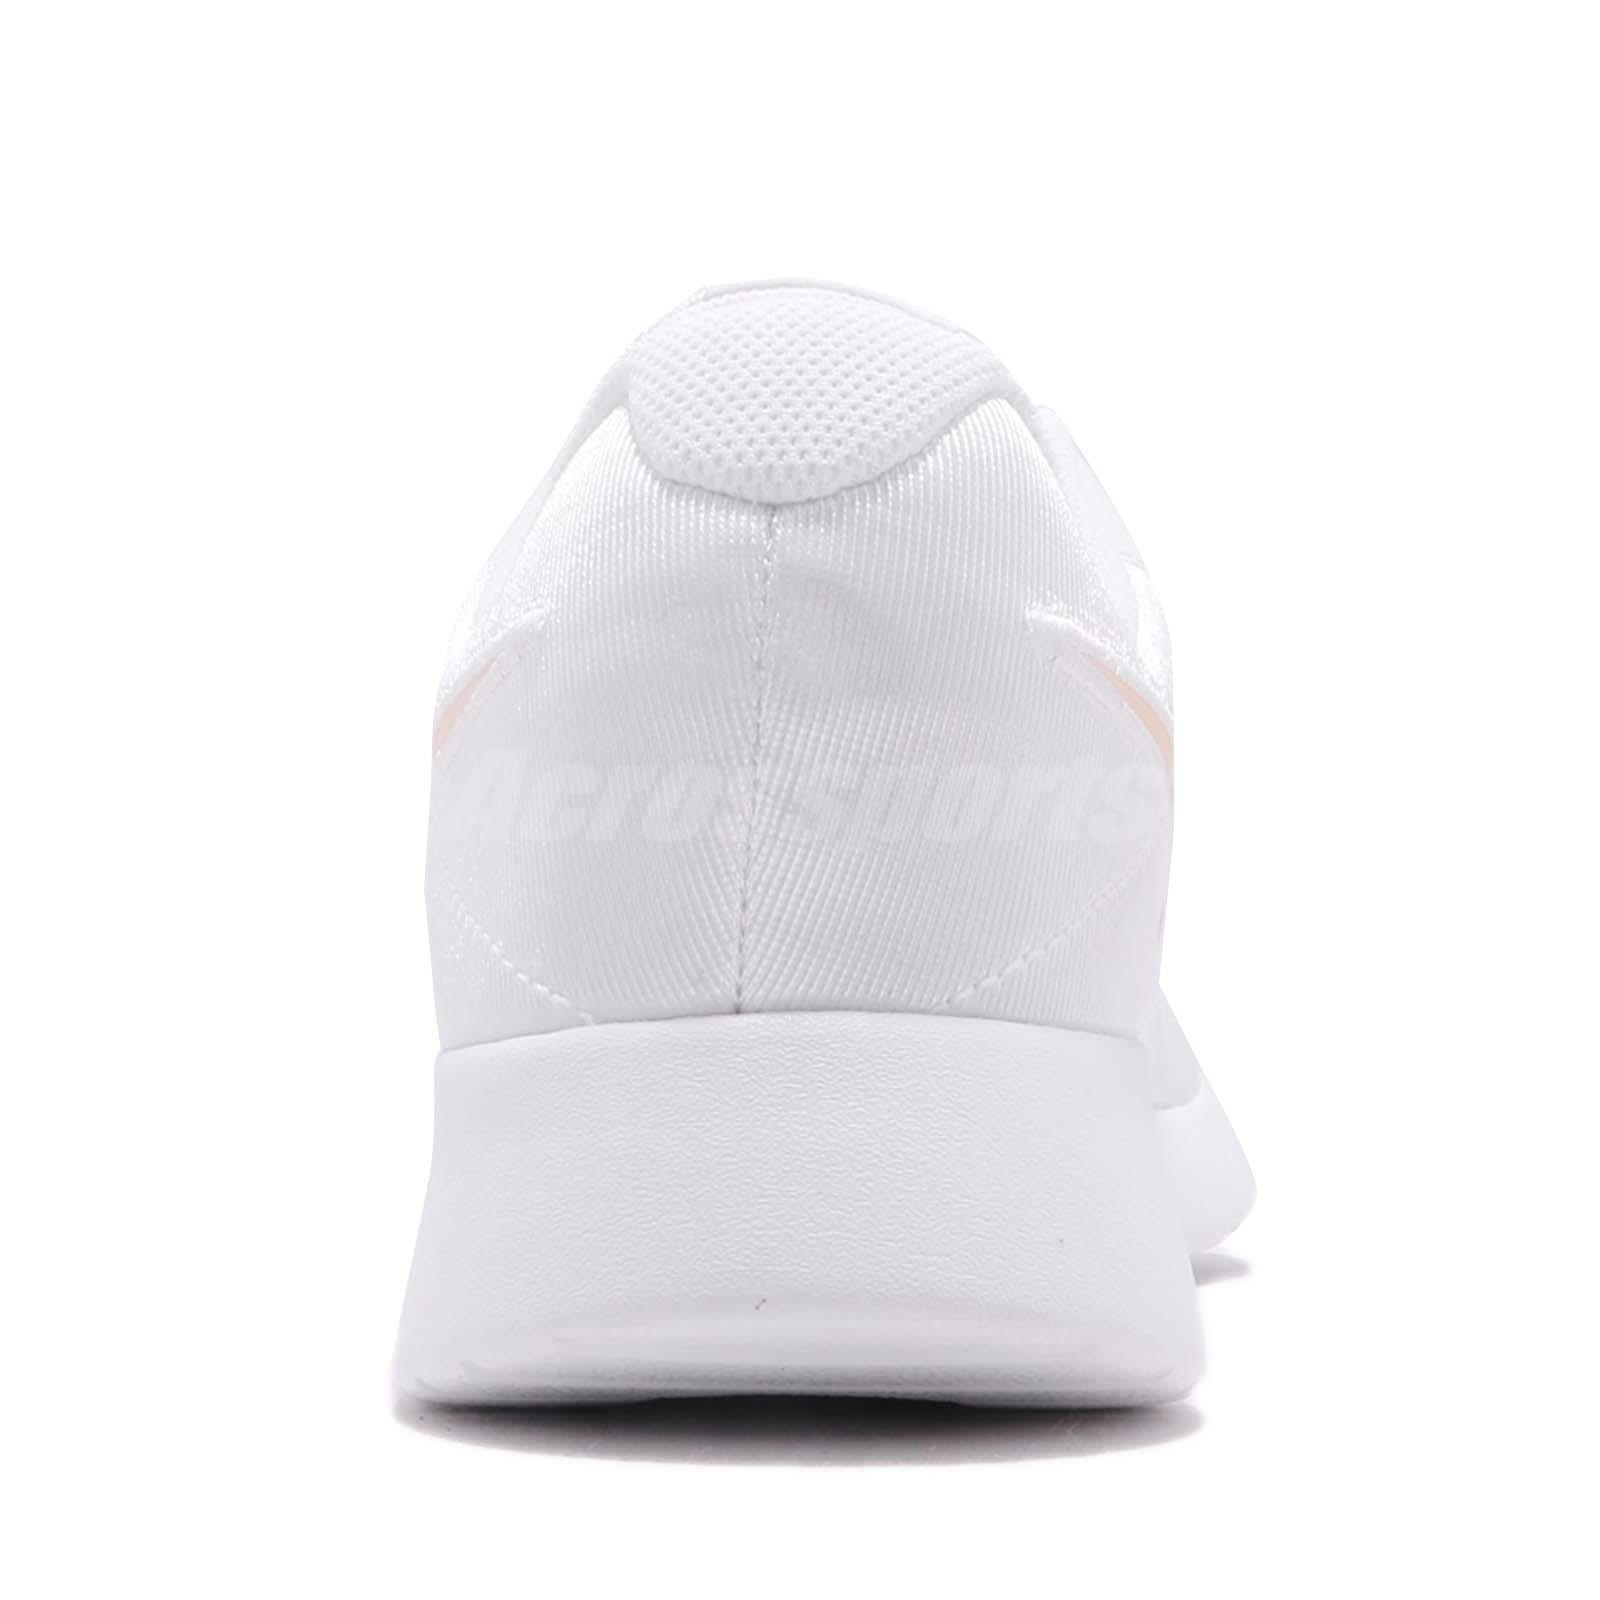 207e0d8062 Nike Tanjun SE White Guava Ice Womens Lifestyle Running Shoes ...